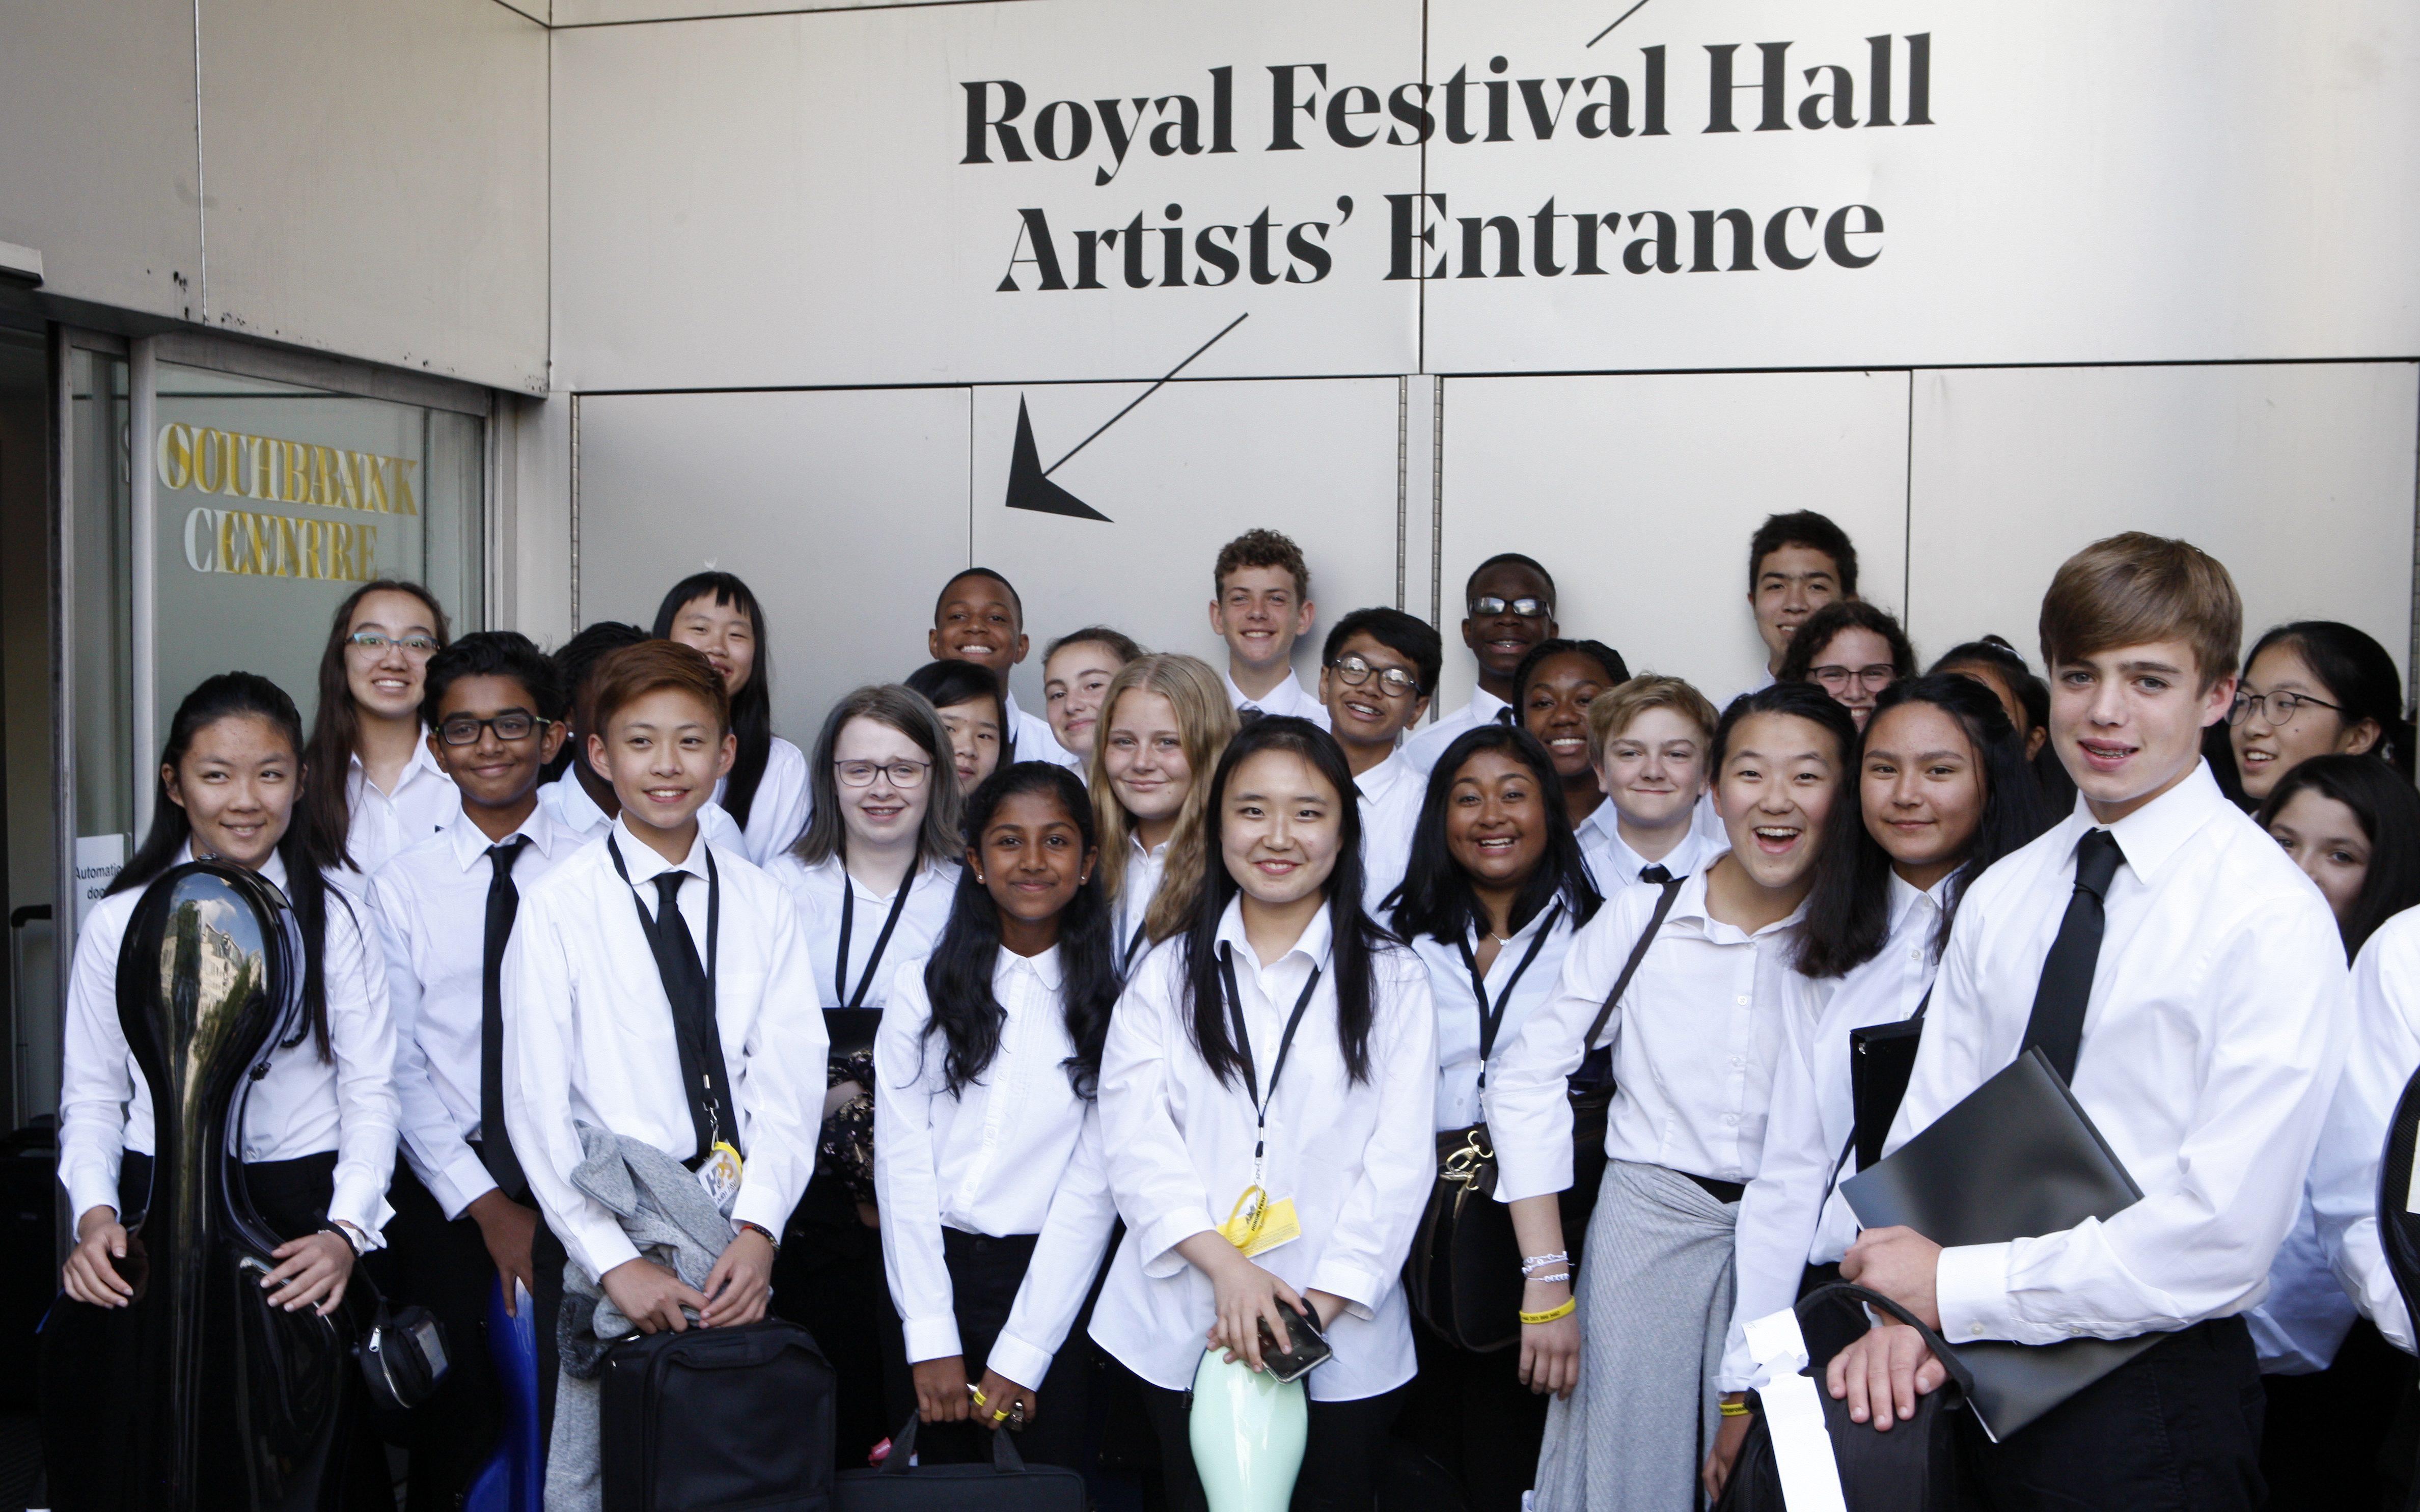 Royal Festival Hall Artists Entrance